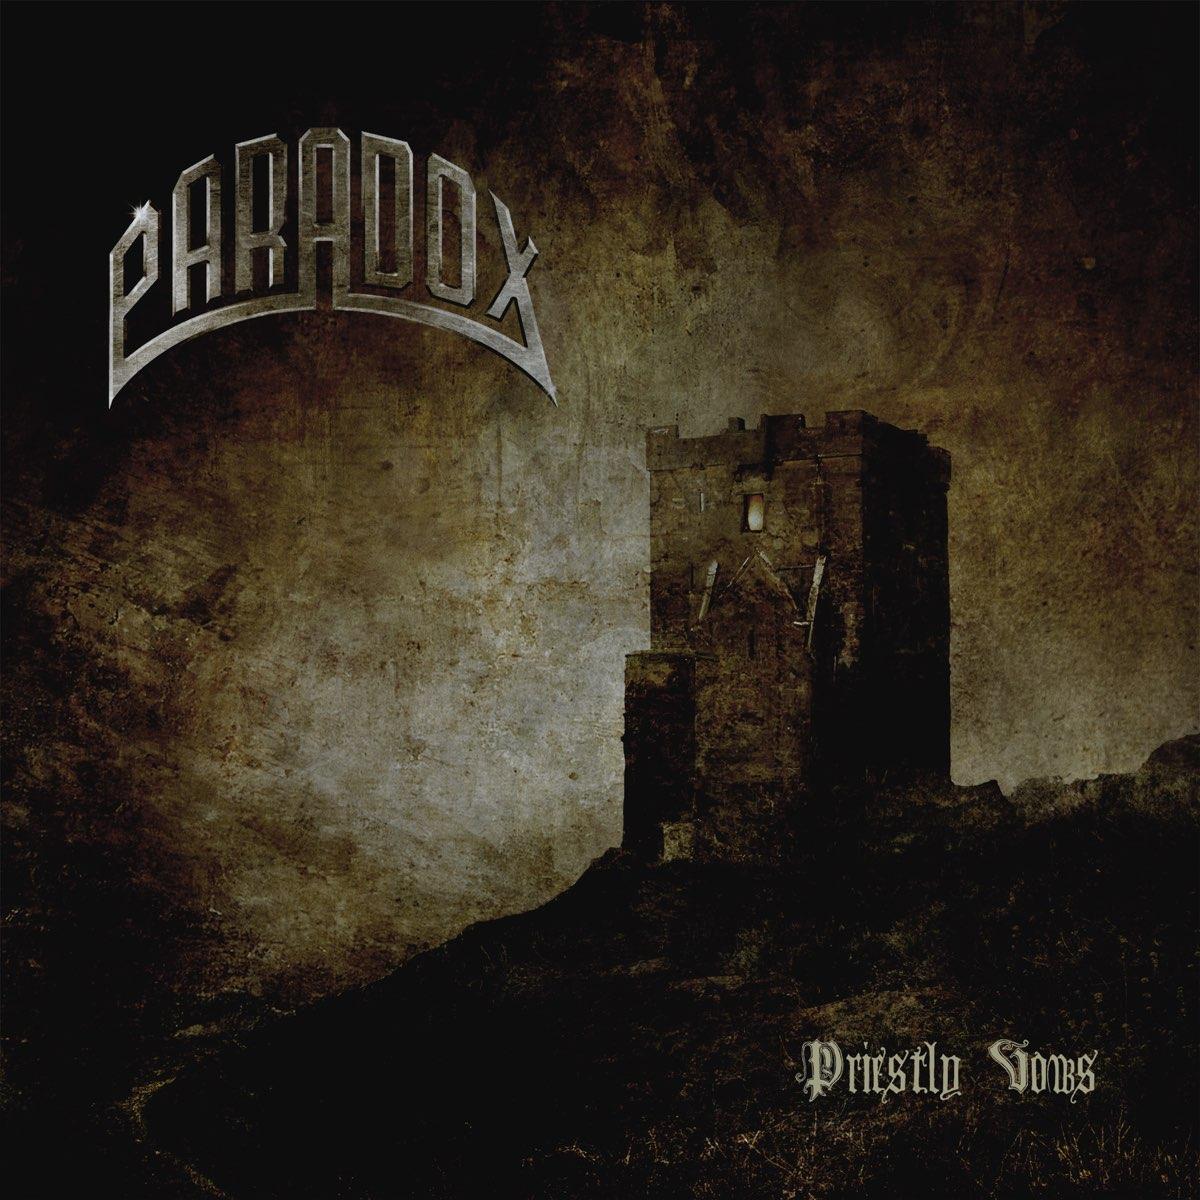 Paradox - Priestly Vows